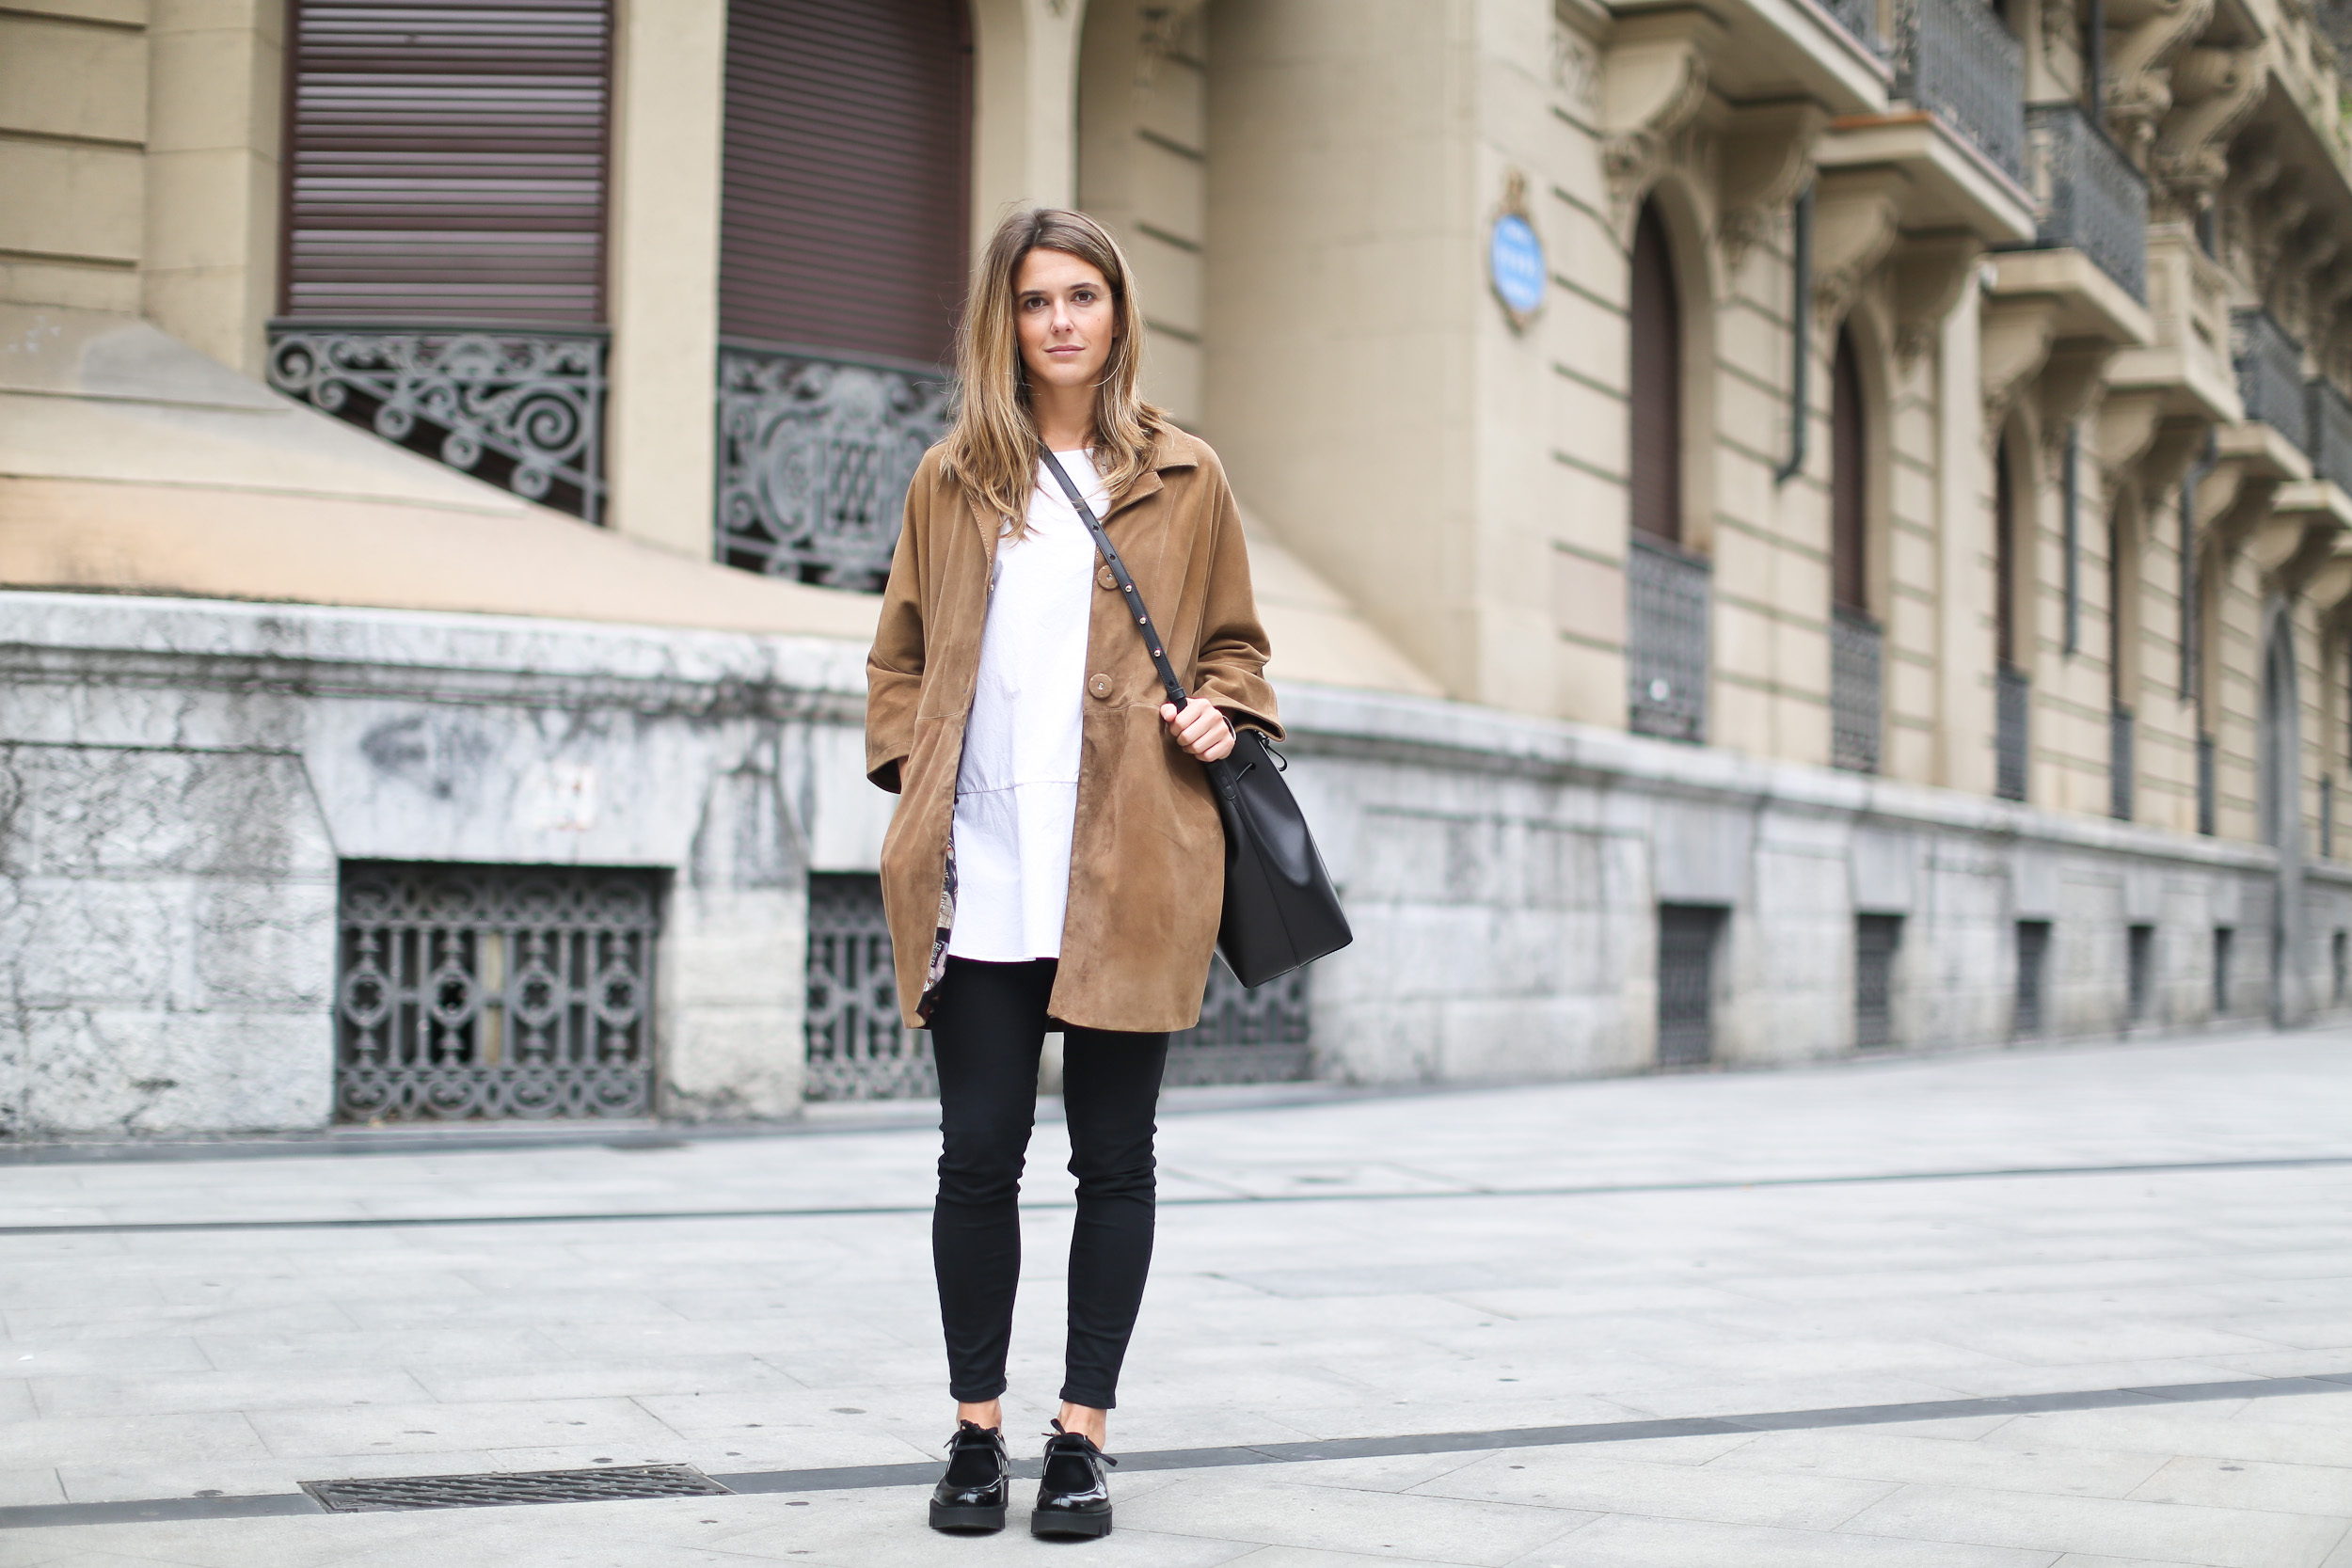 Clochet_streetstyle_boxcalf_chaqueta_ante_platform_brogues_masur_gavriel_bucket_bag-4